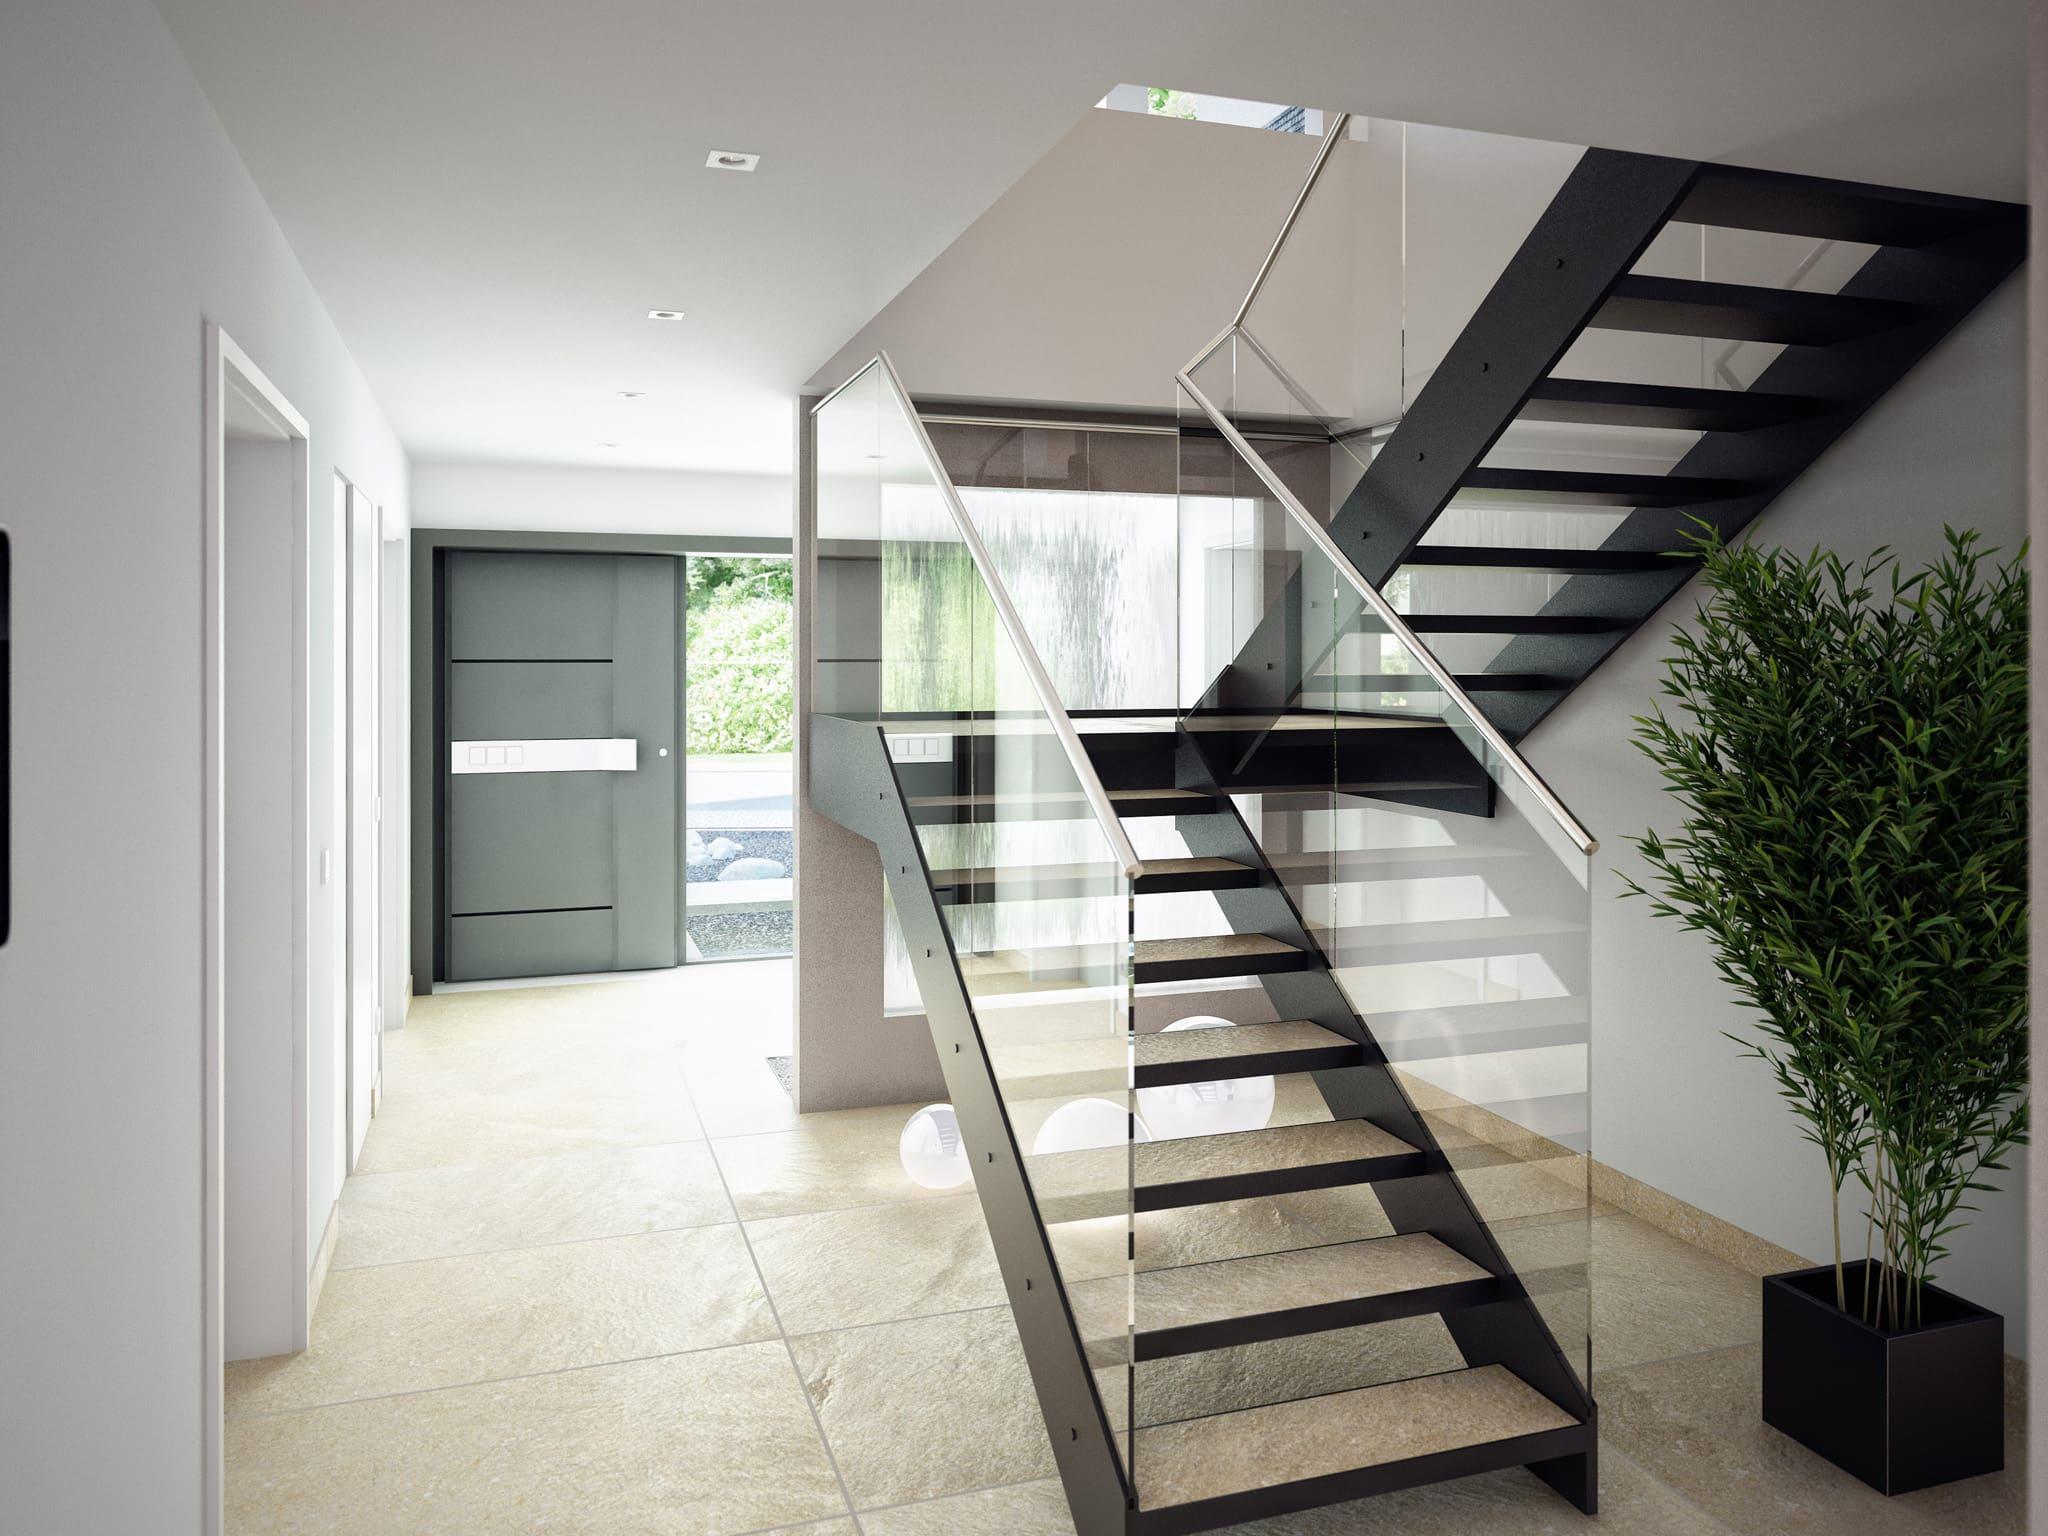 Offene Treppe Flur - Ideen Inneneinrichtung Einfamilienhaus Bien-Zenker Fertighaus CONCEPT-M Muenchen - HausbauDirekt.de